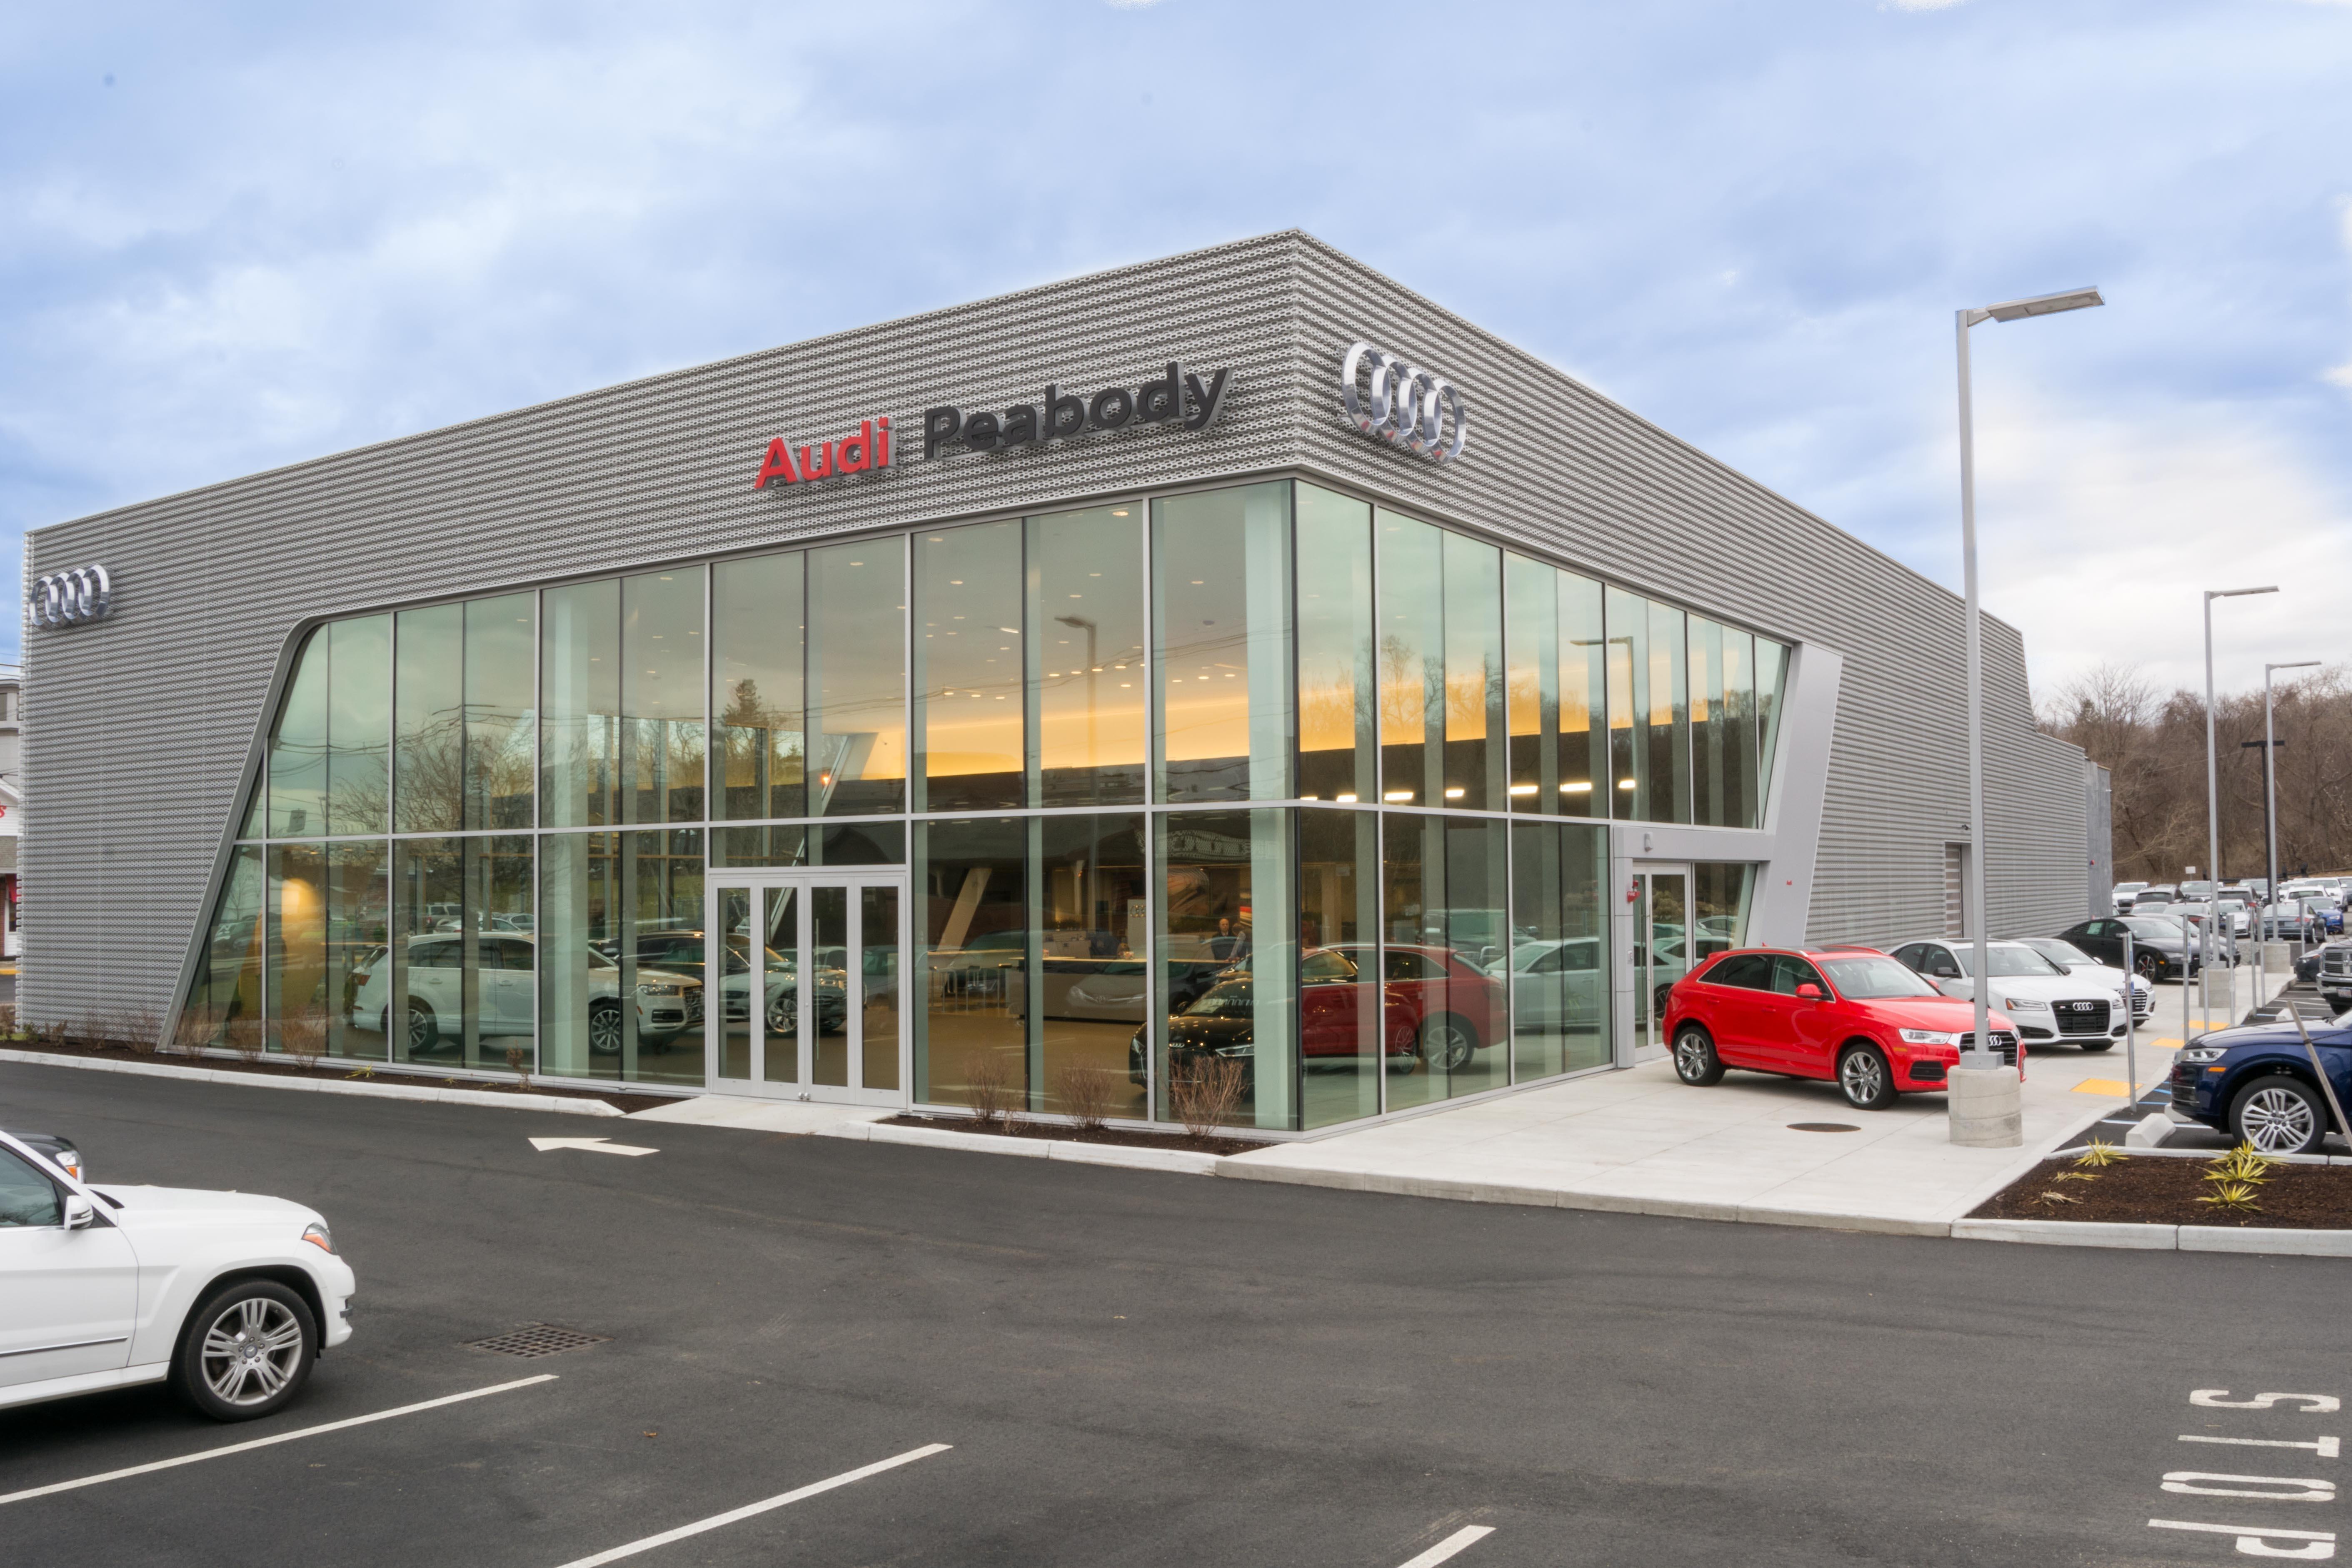 Audi Peabody - 252 Andover Street, Peabody, MA | n49.com